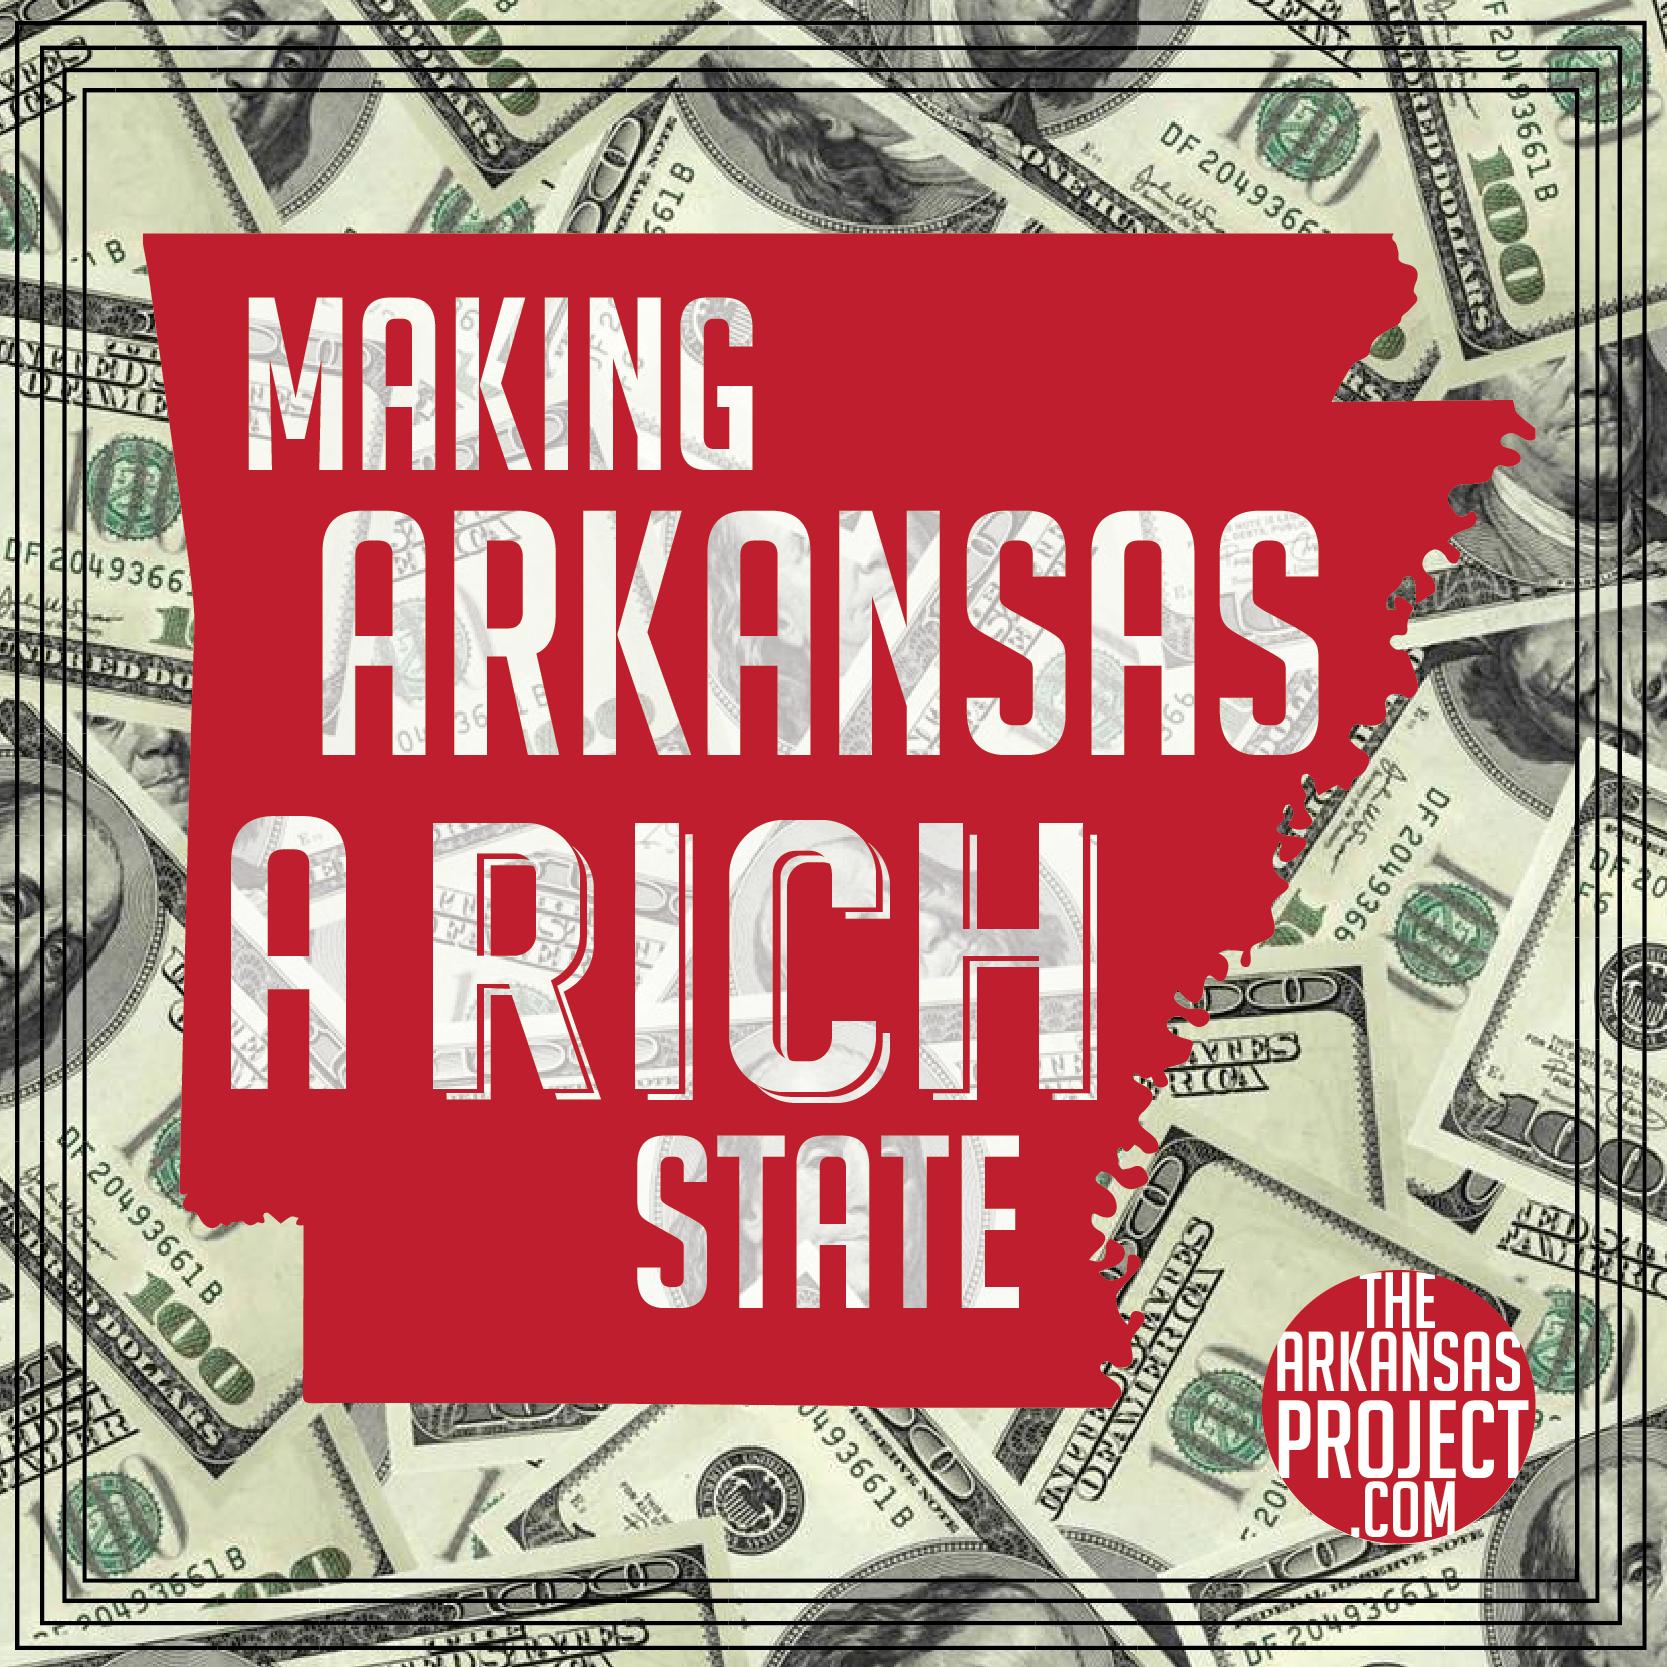 STUDY: Arkansas's Economic Outlook Falls In 2017